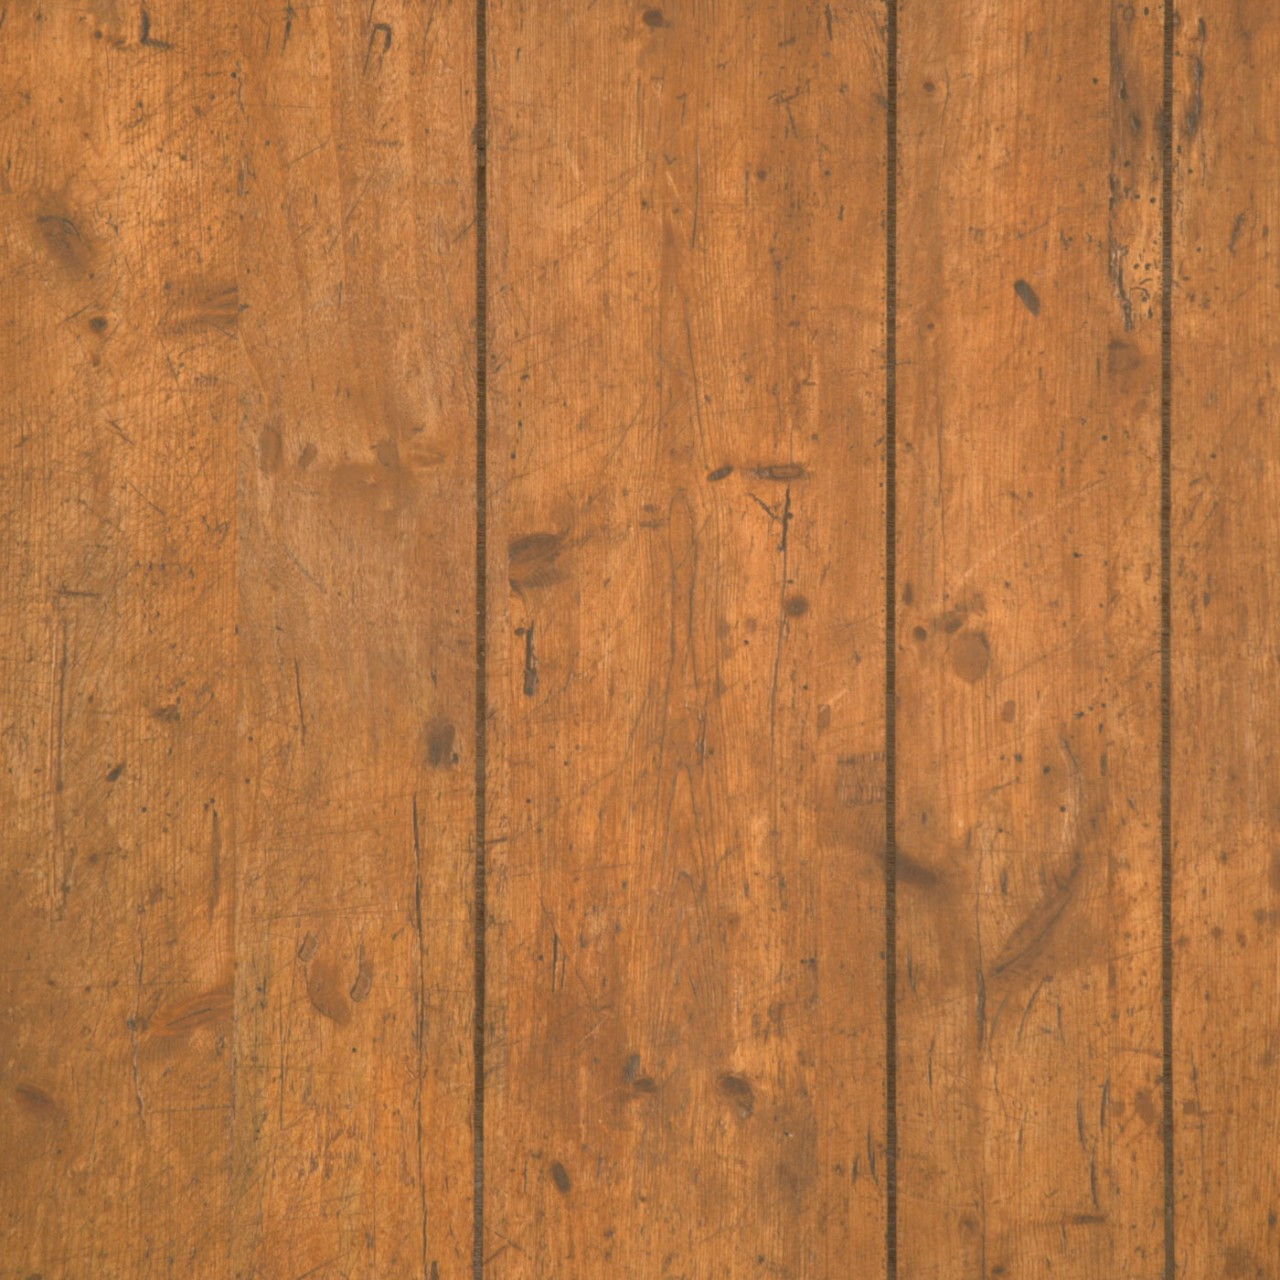 wood paneling rustic homestead wine cellar oak